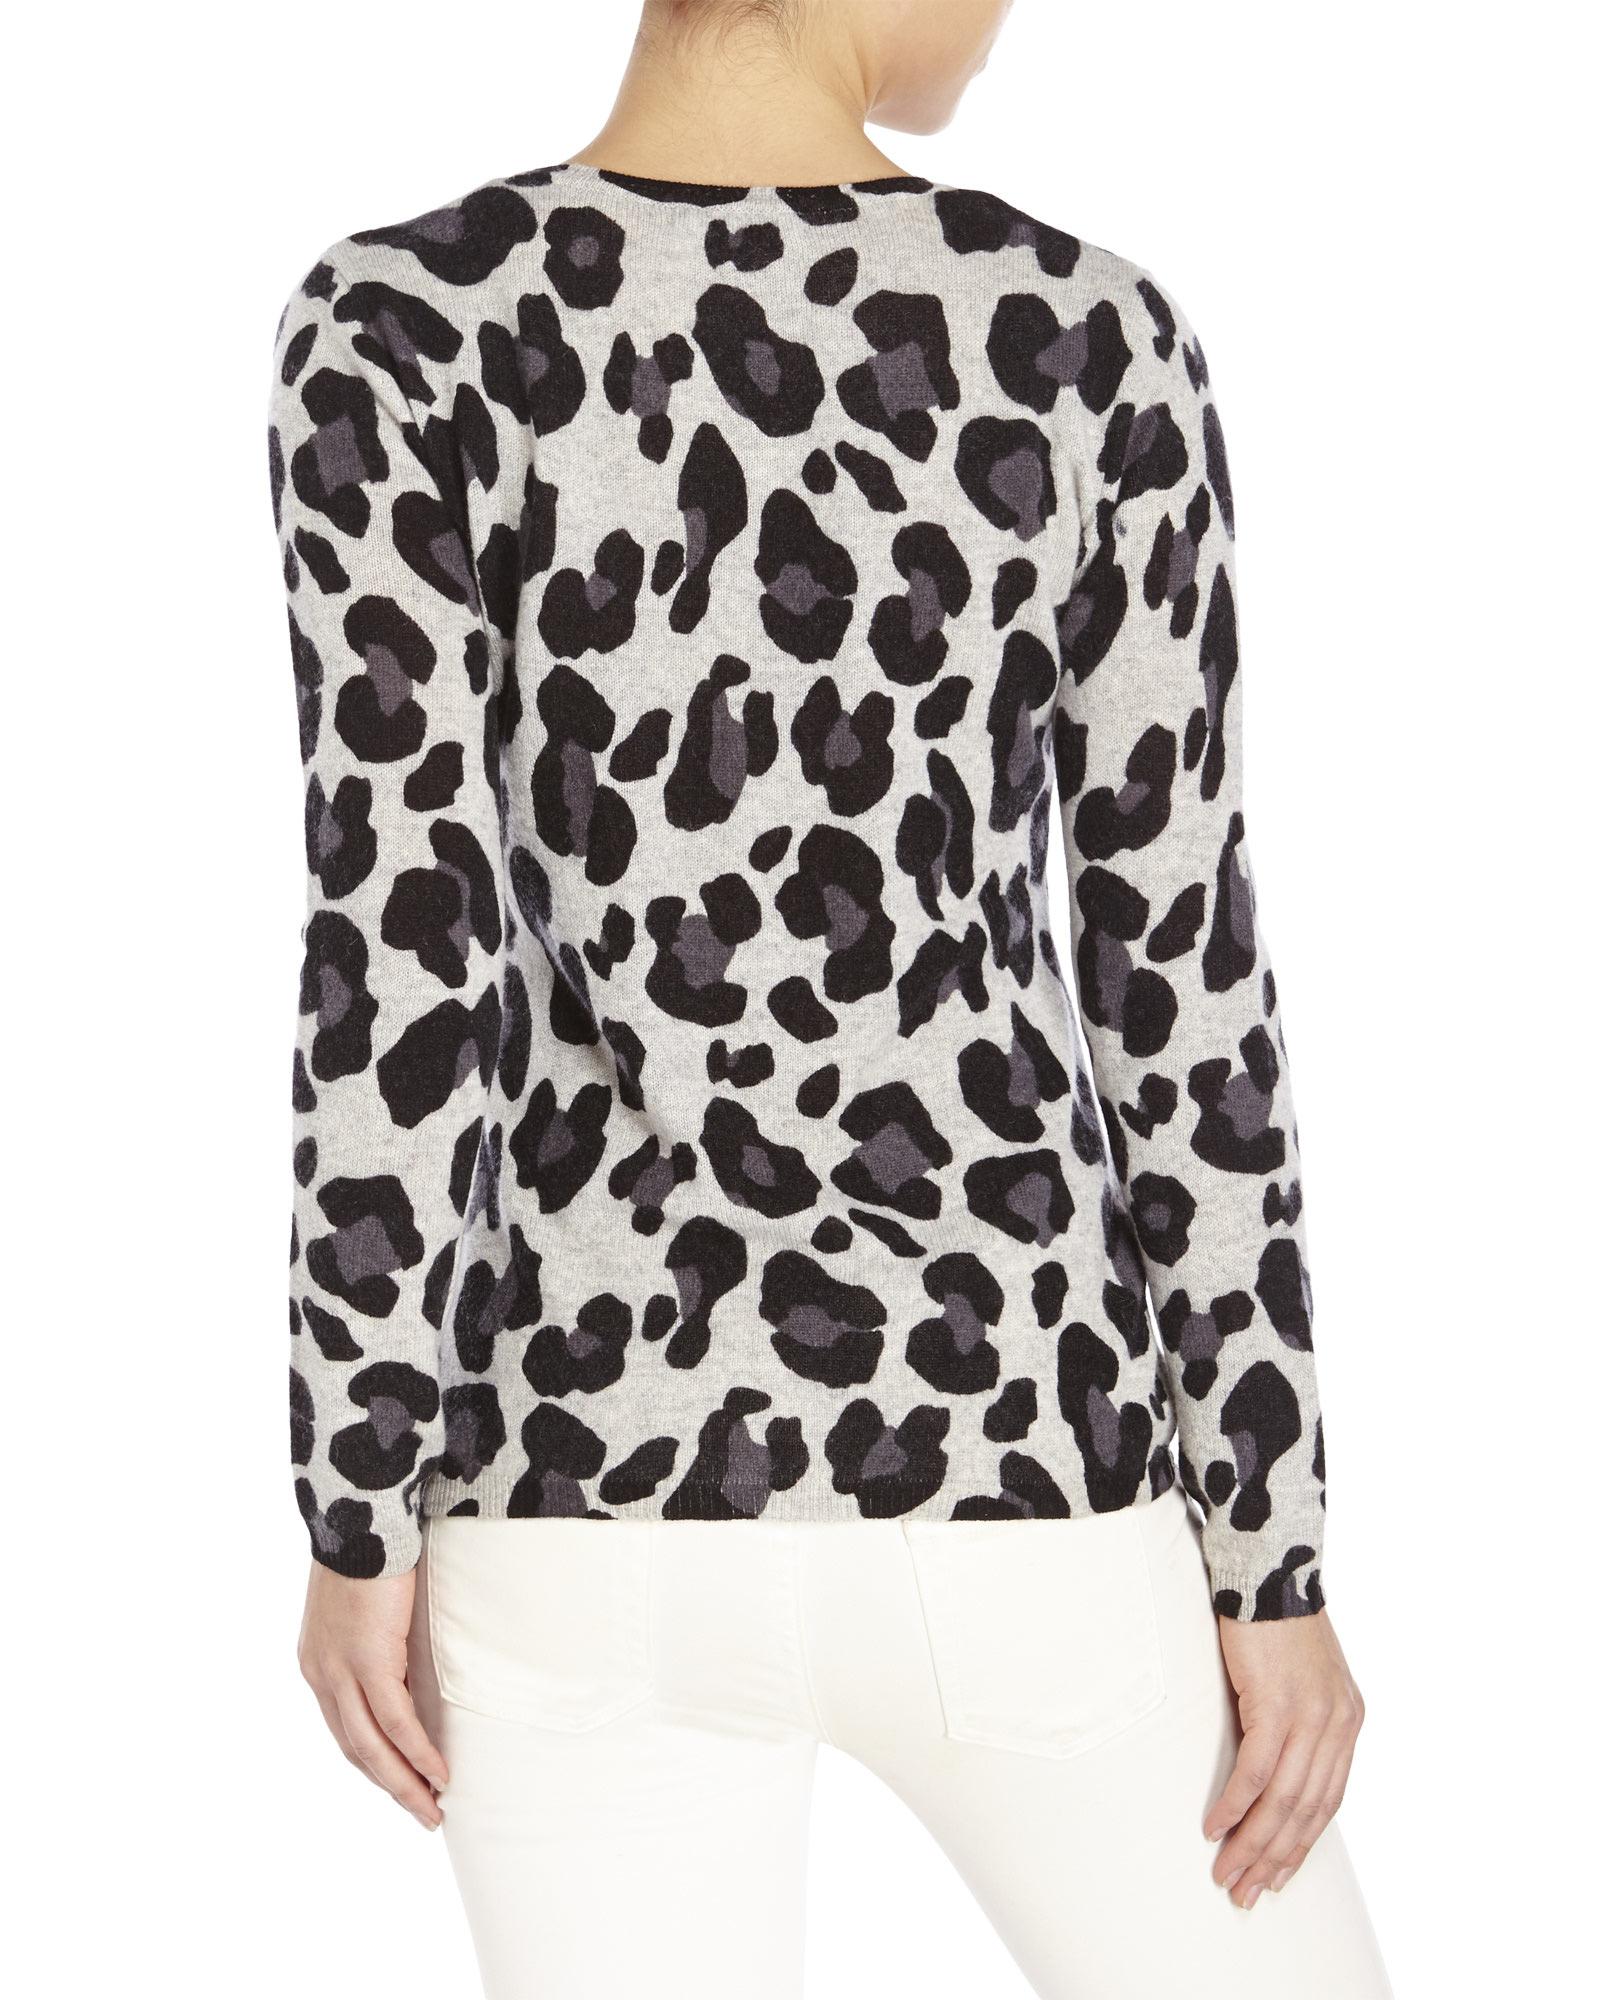 Lauren hansen Leopard Print Cashmere Sweater in Gray | Lyst